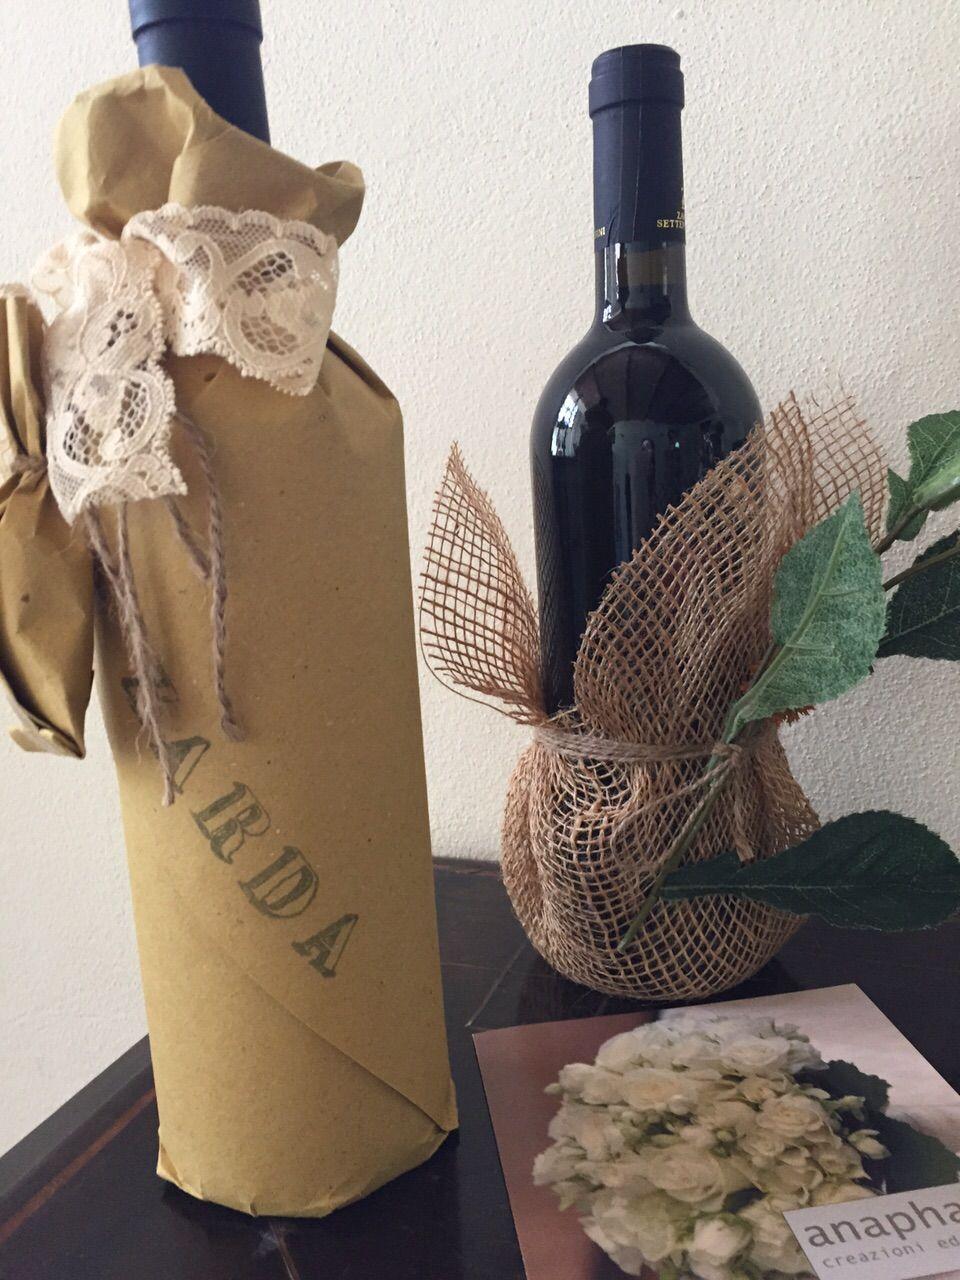 Bomboniere con il vino Zarda (Anaphalis)